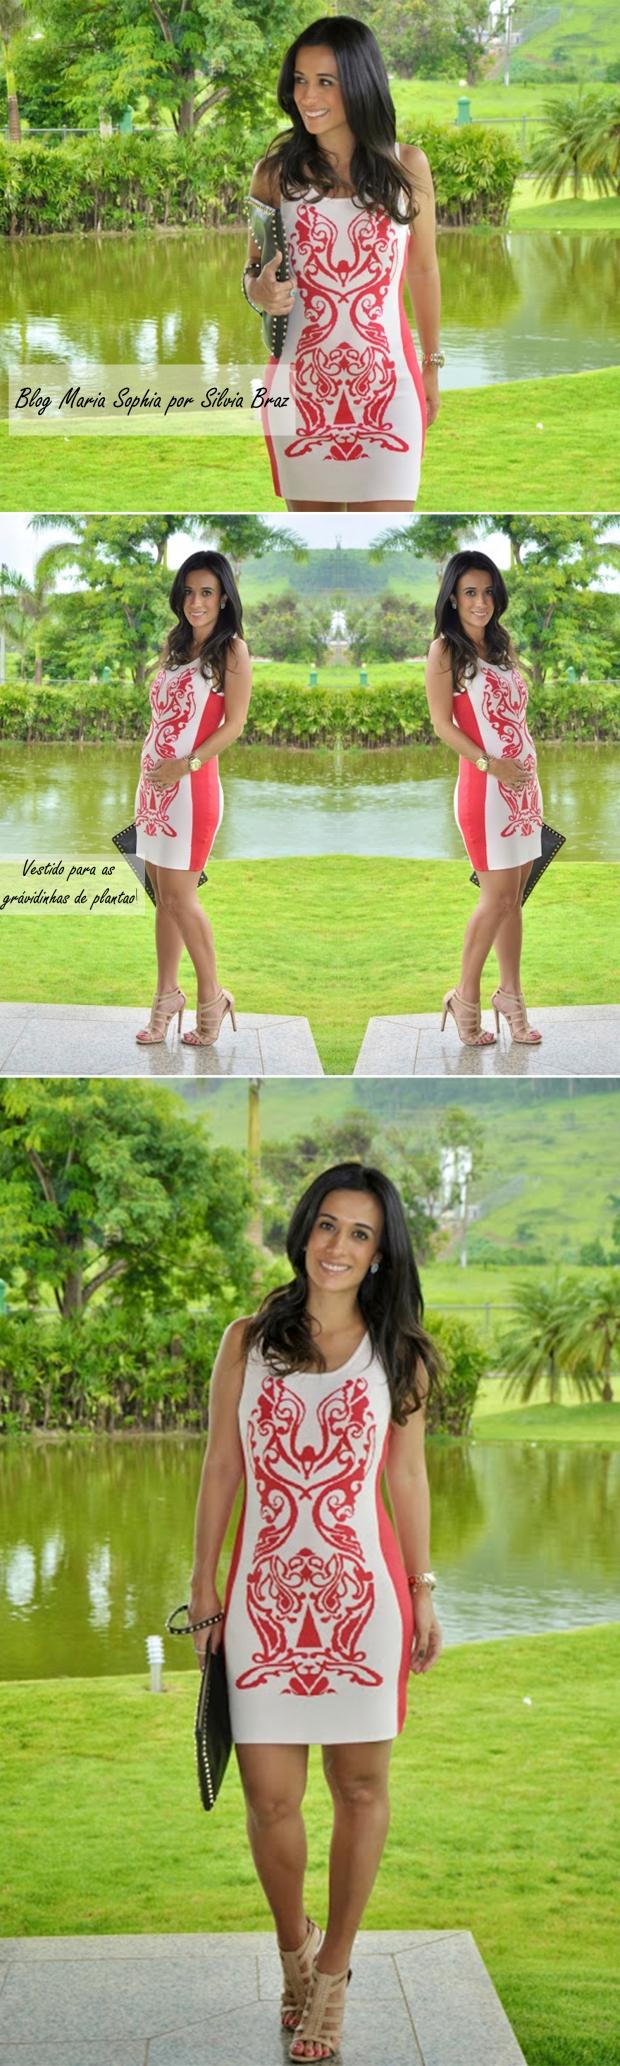 look,blog,post,analoren,quinta